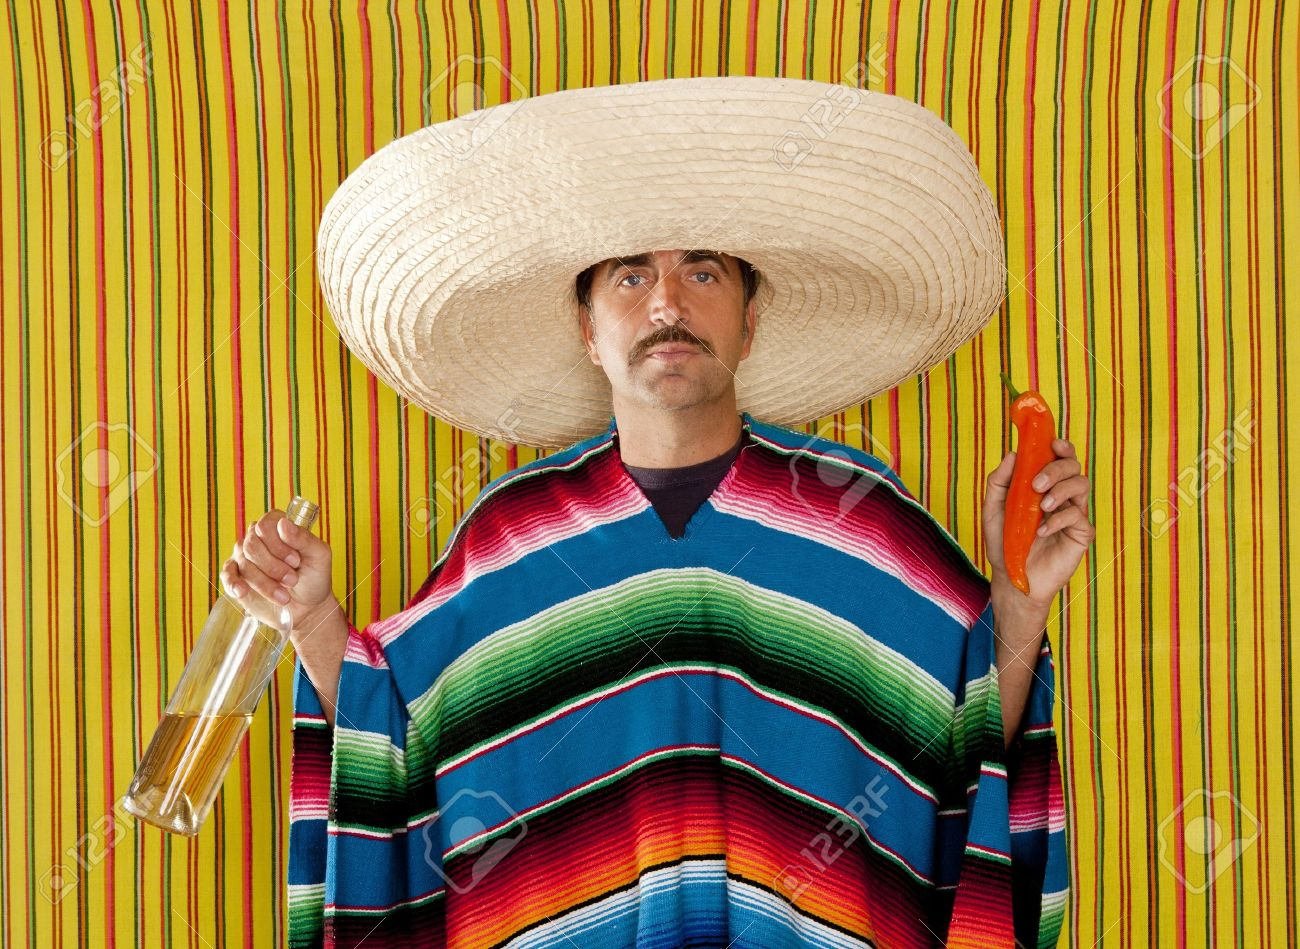 Hombre típico mexicano comer hot chili pepper y beber tequila con poncho Foto de archivo - 9942809